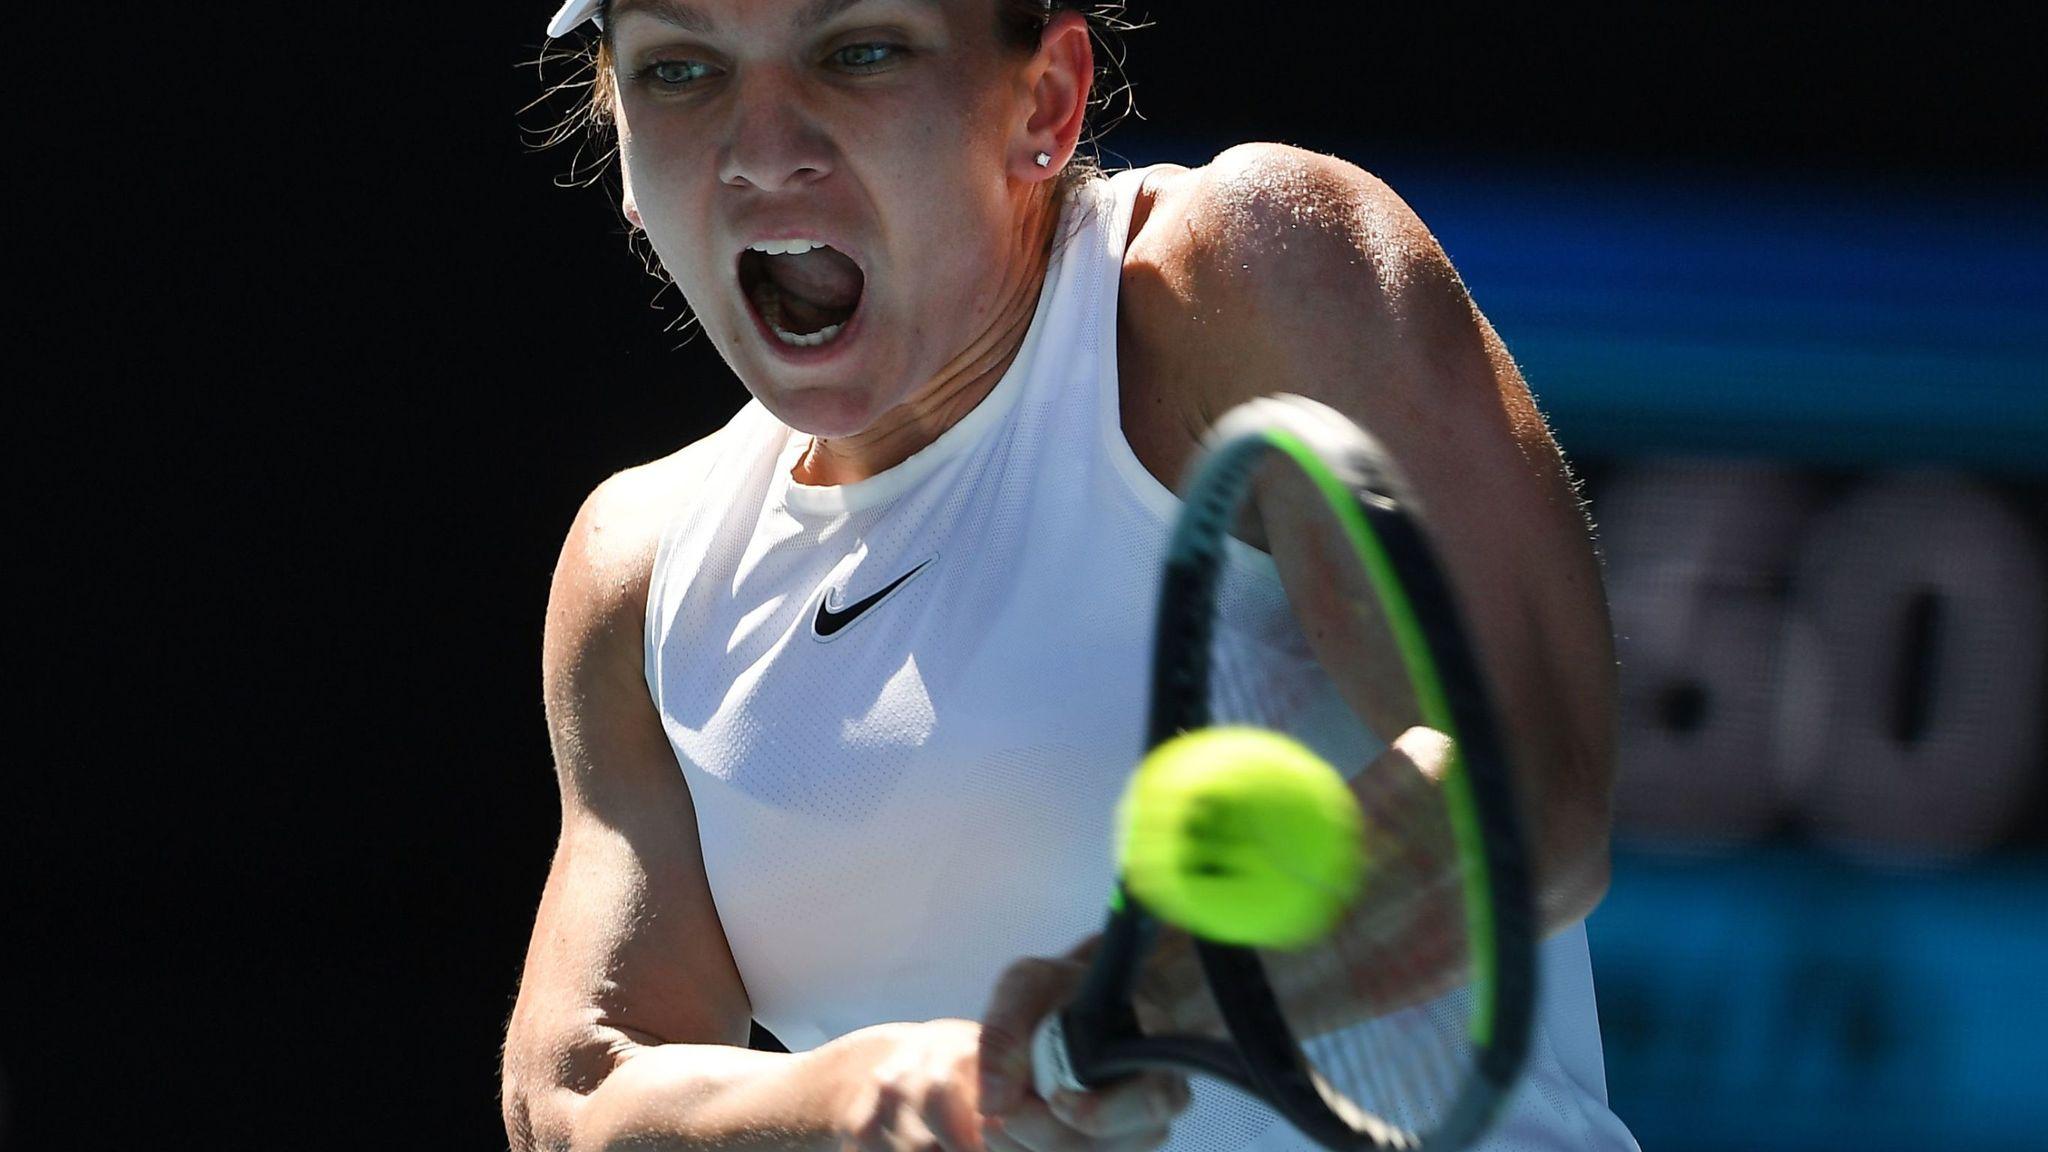 Garbine Muguruza defeats Simona Halep to reach the Australian Open final